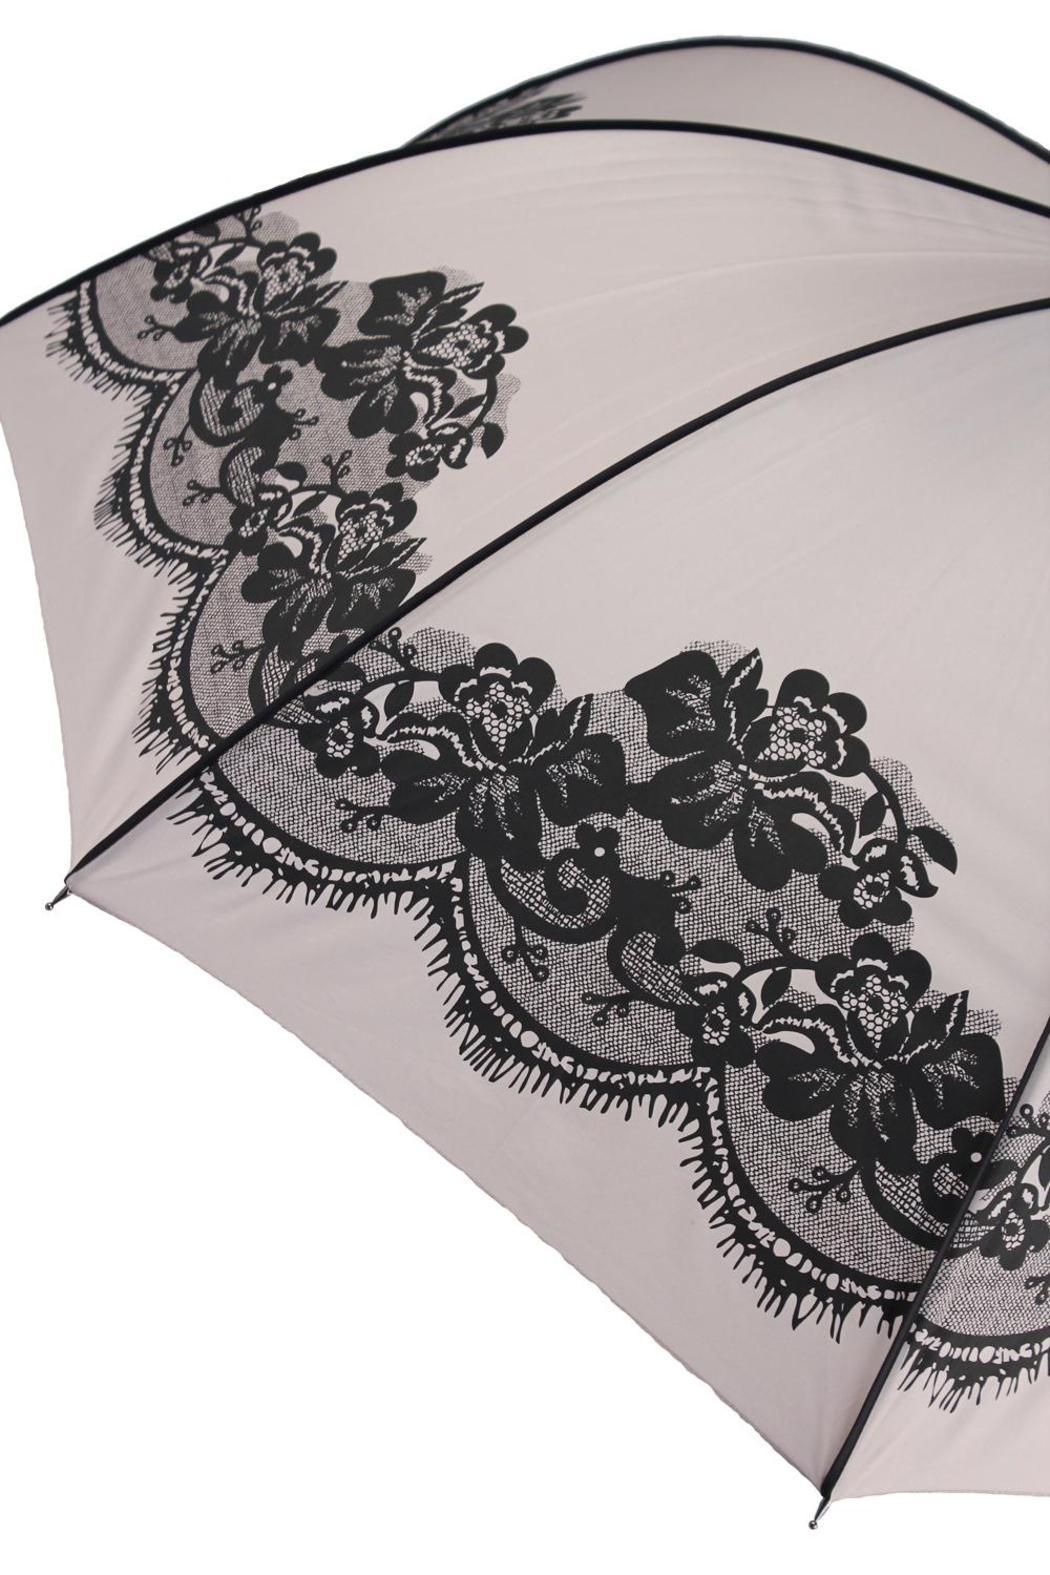 Vtc Lace Print Umbrella From Seattle By Bella Umbrella A